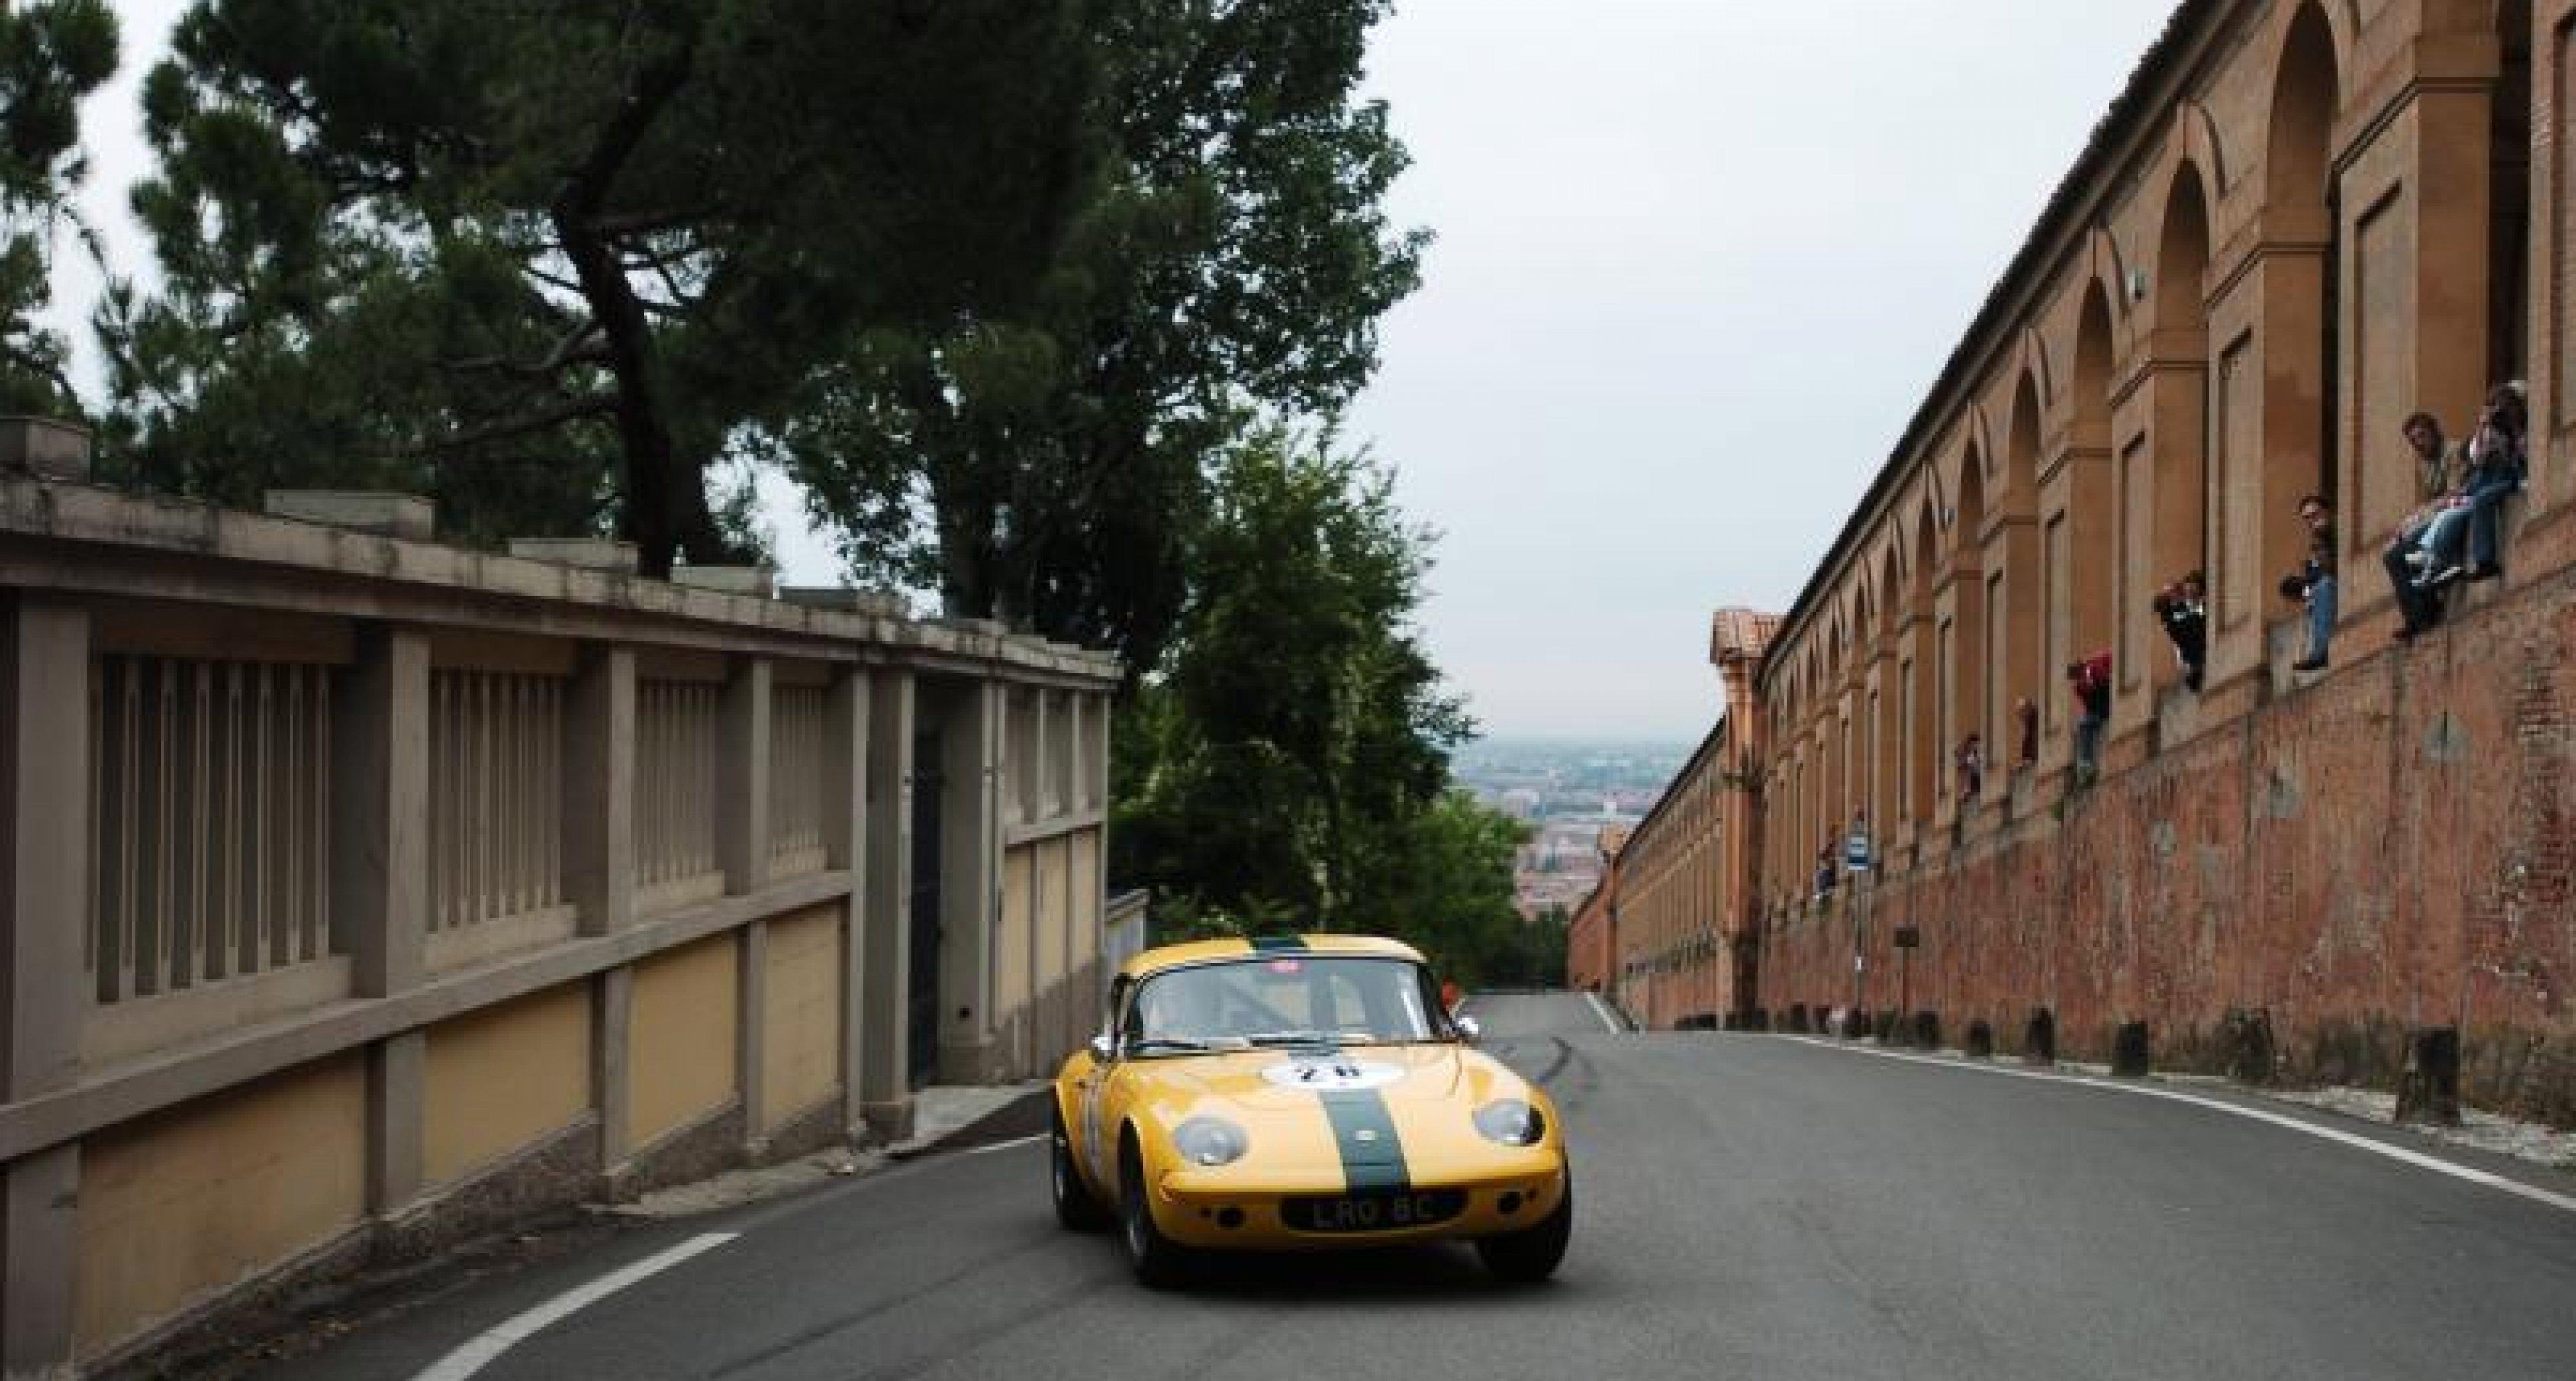 Bologna-San Luca Hillclimb 2006